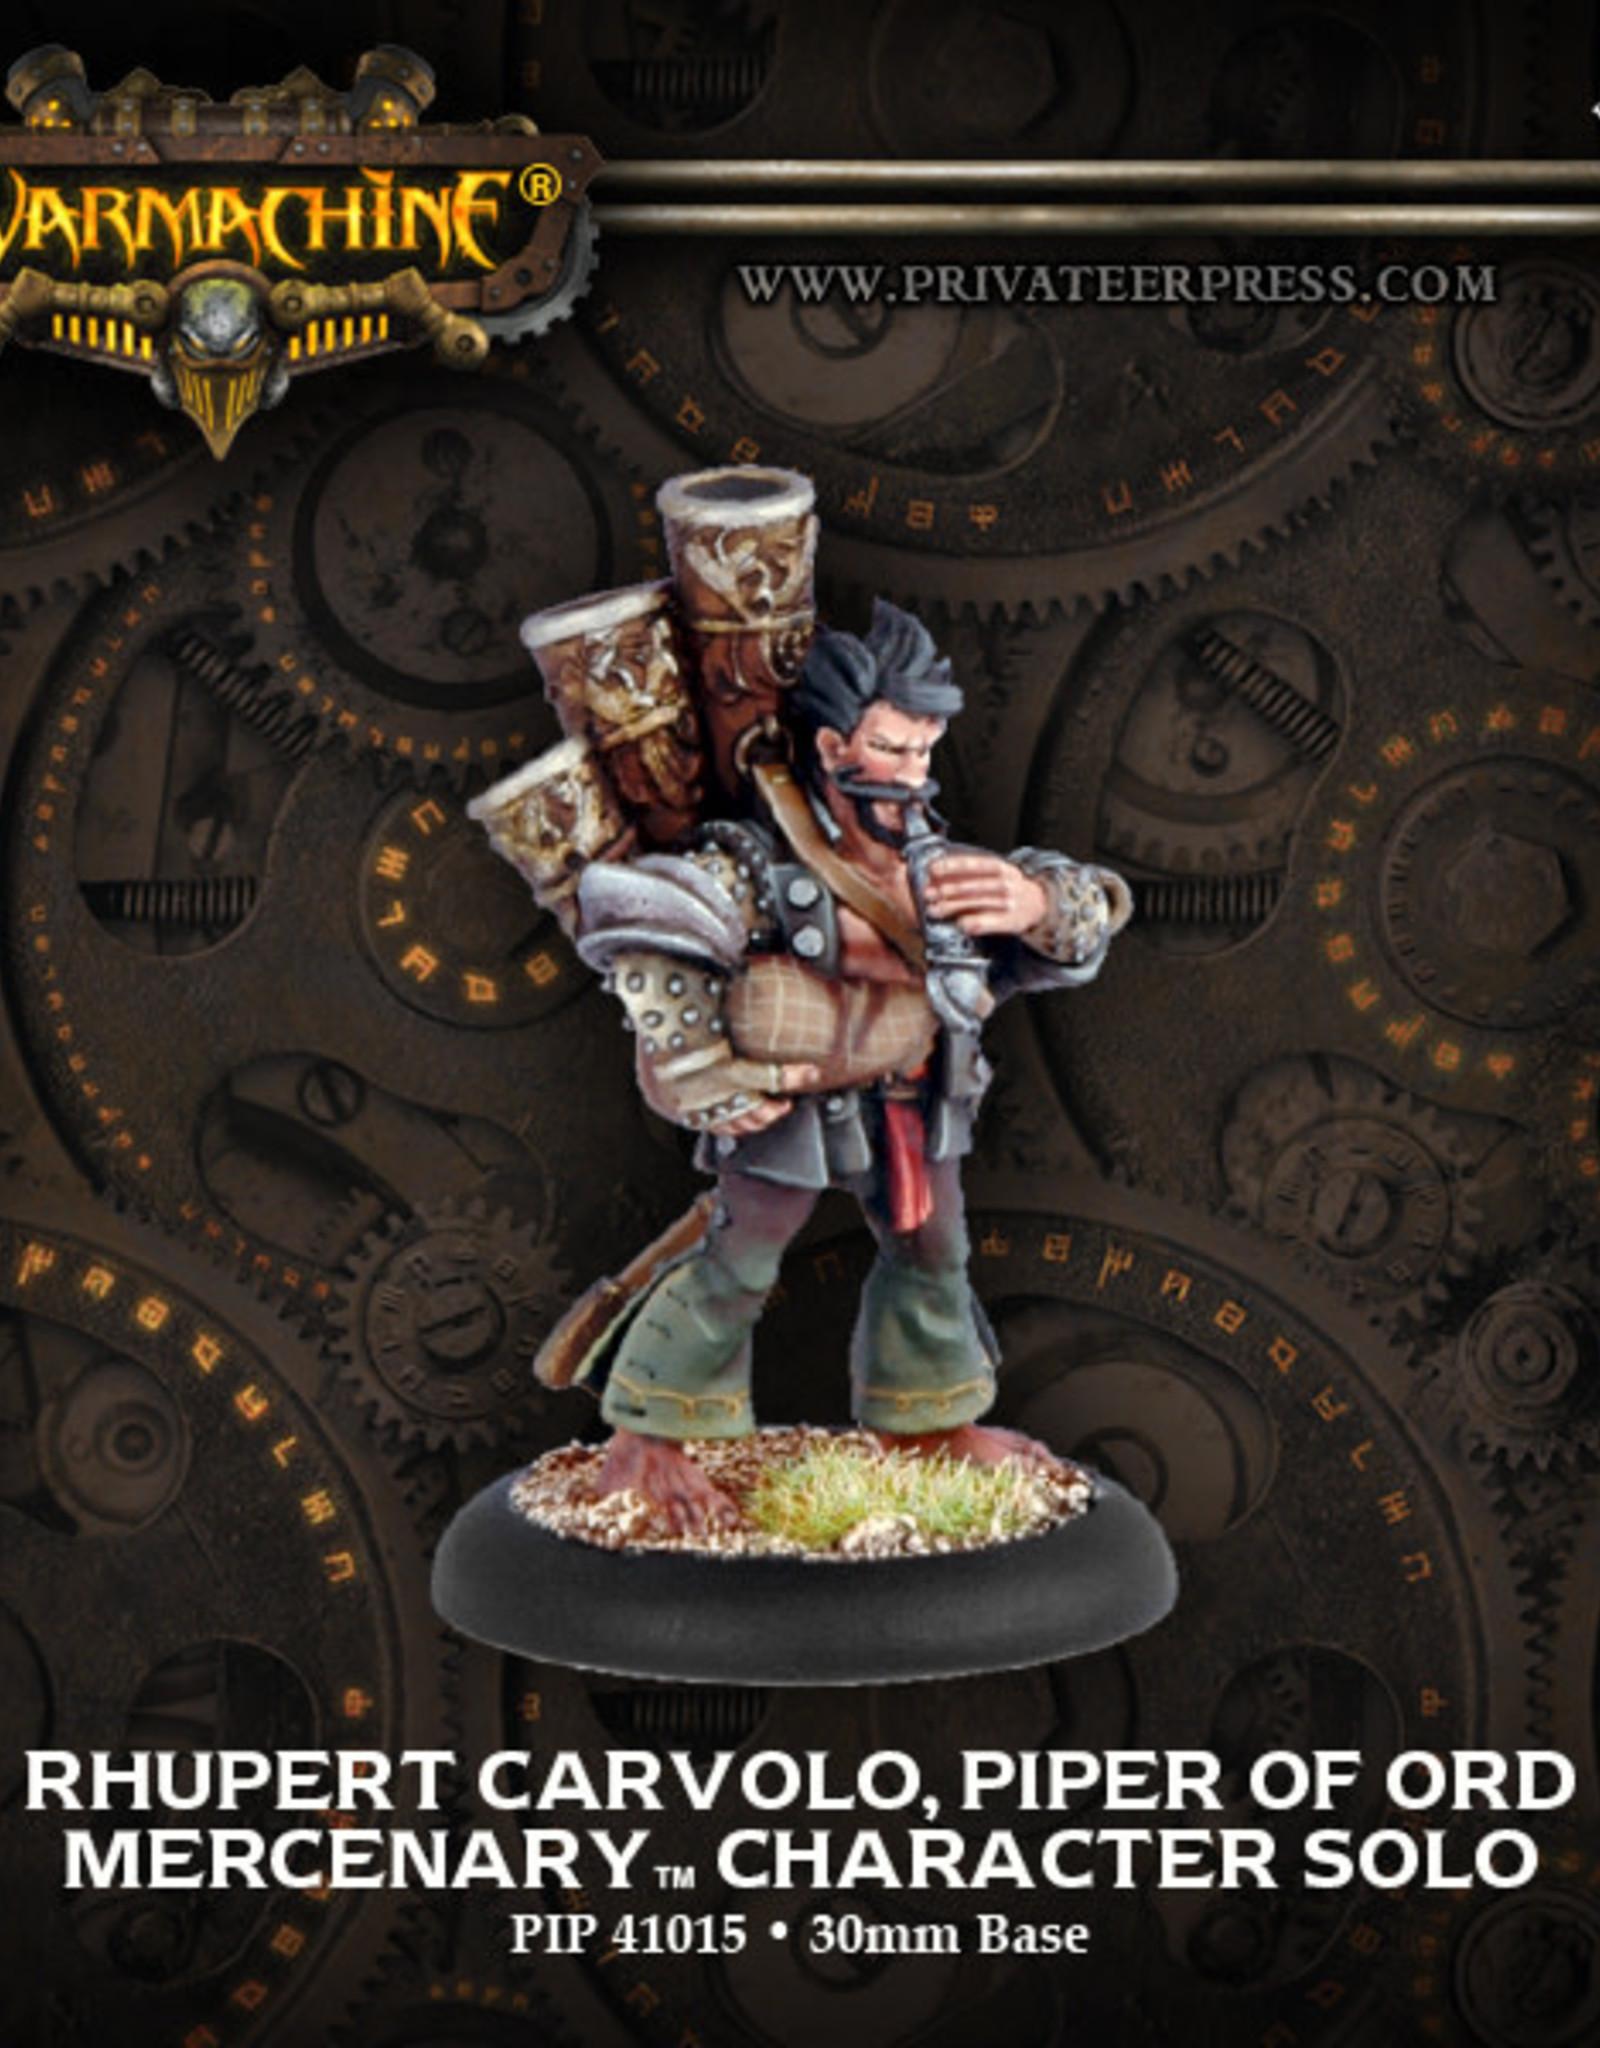 Warmachine Mercenaries - Rhupert Carvolo